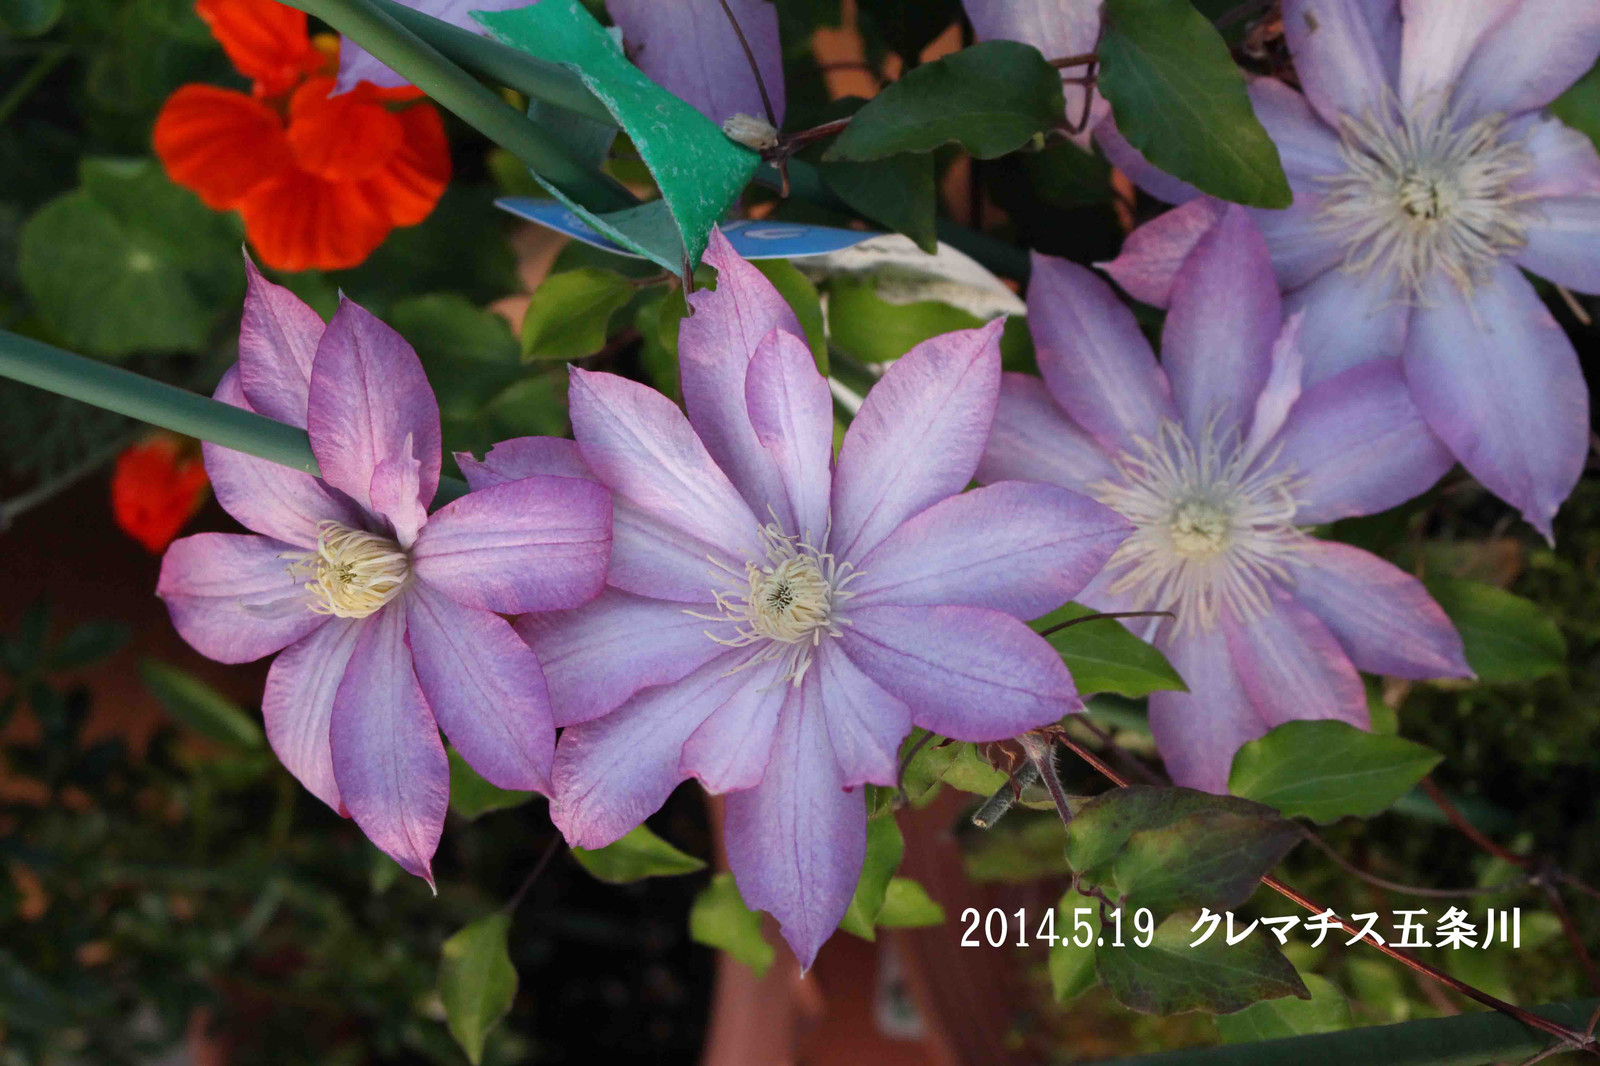 2014_05_19_9565_edited1